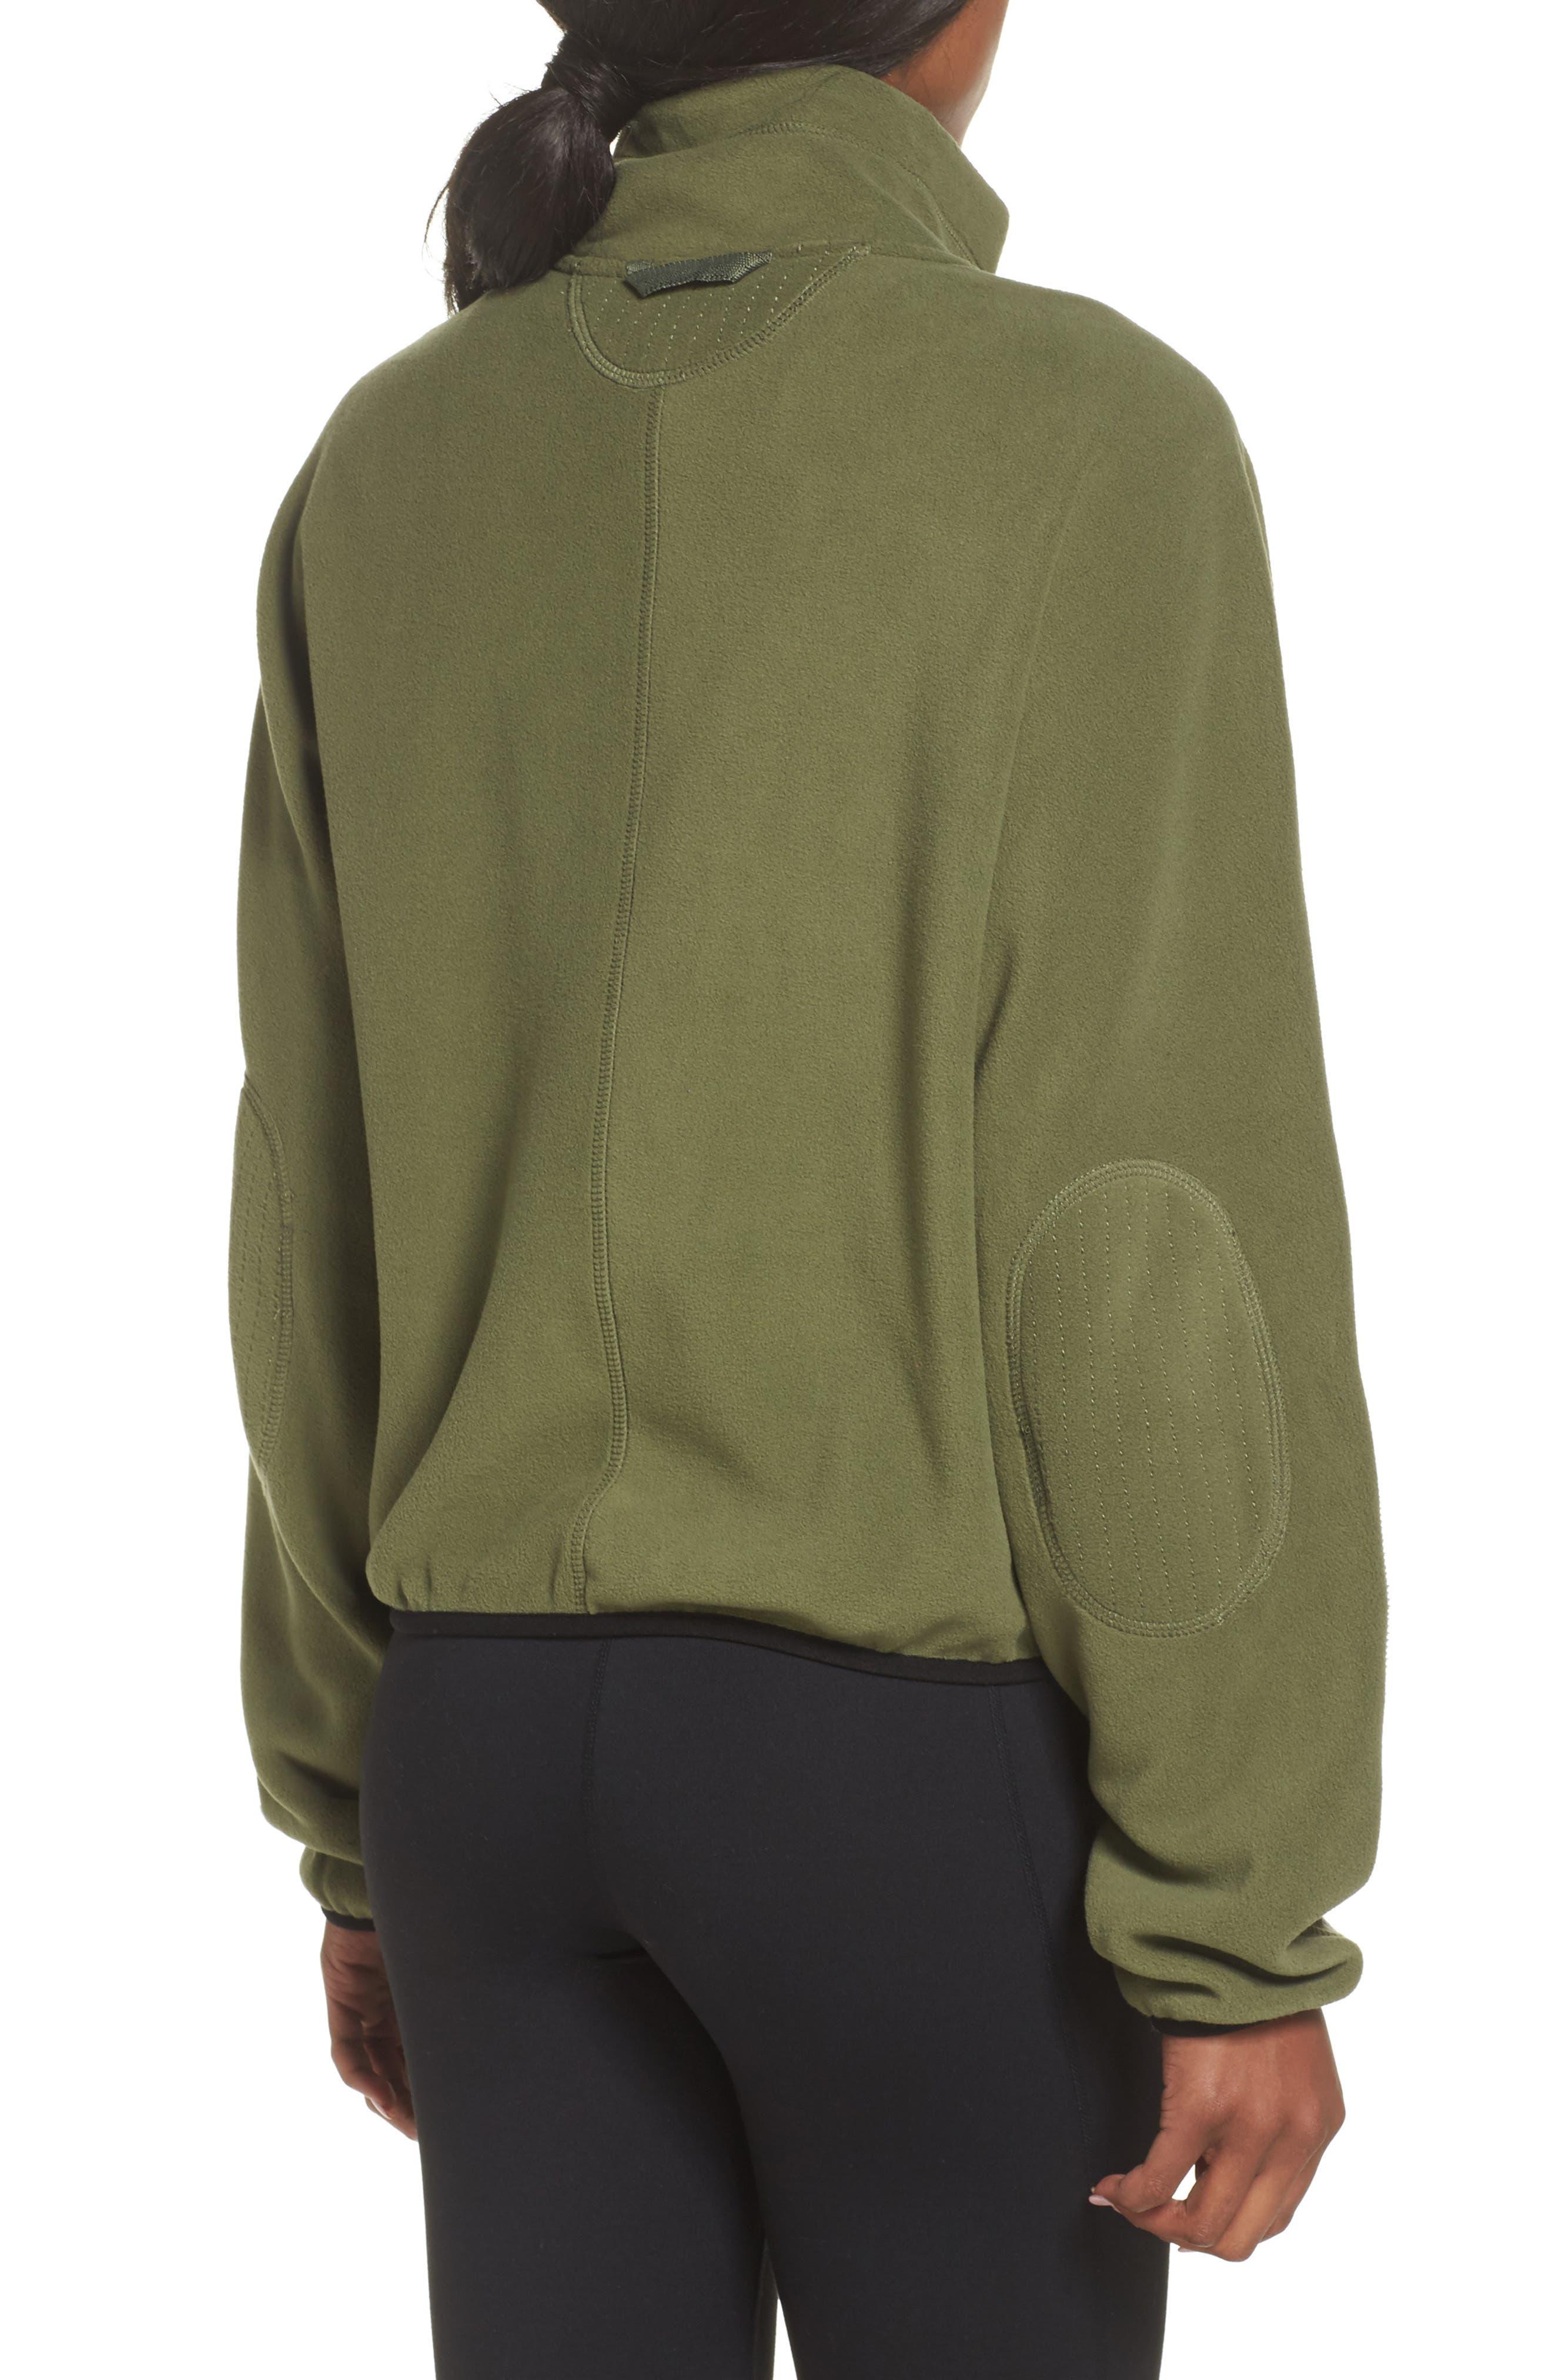 FP Movement Higher Ground Fleece Jacket,                             Alternate thumbnail 4, color,